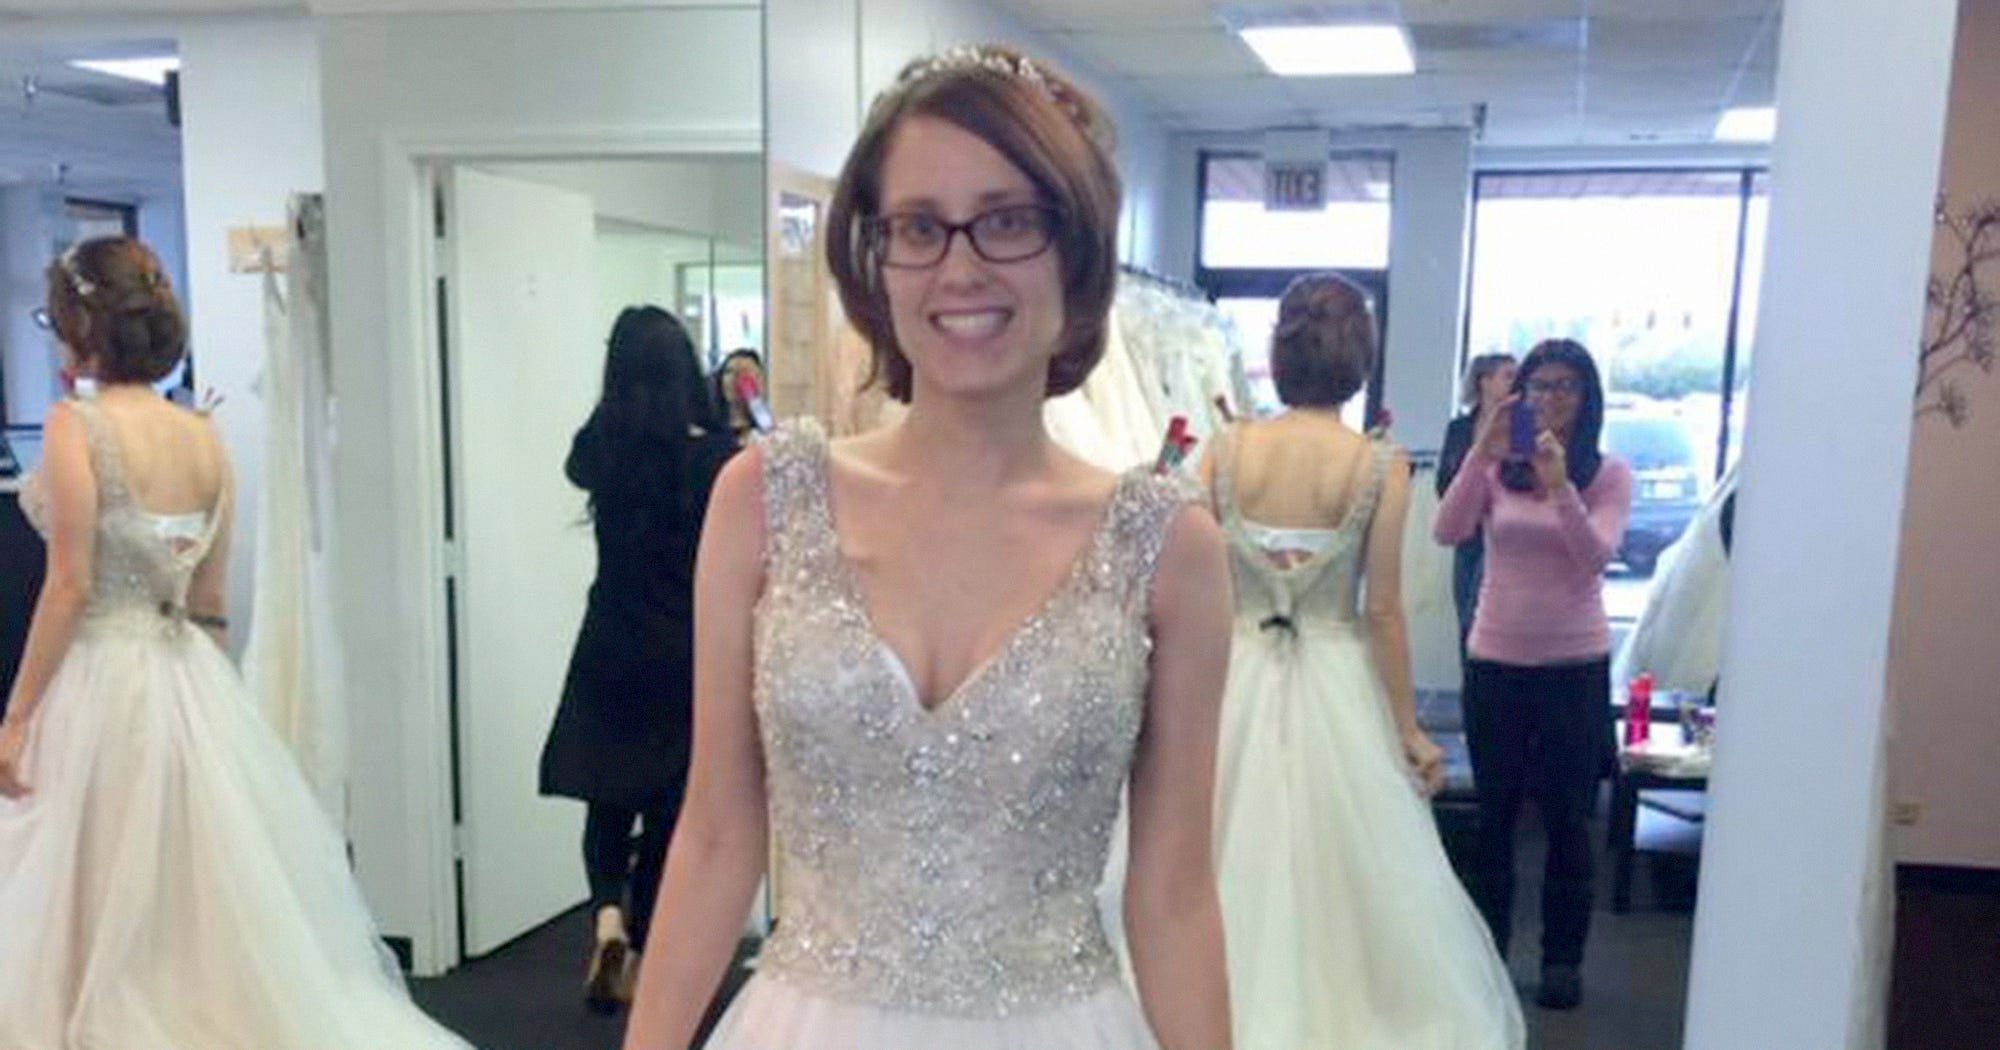 Widower Late Wife Wedding Dress Photo Grieving